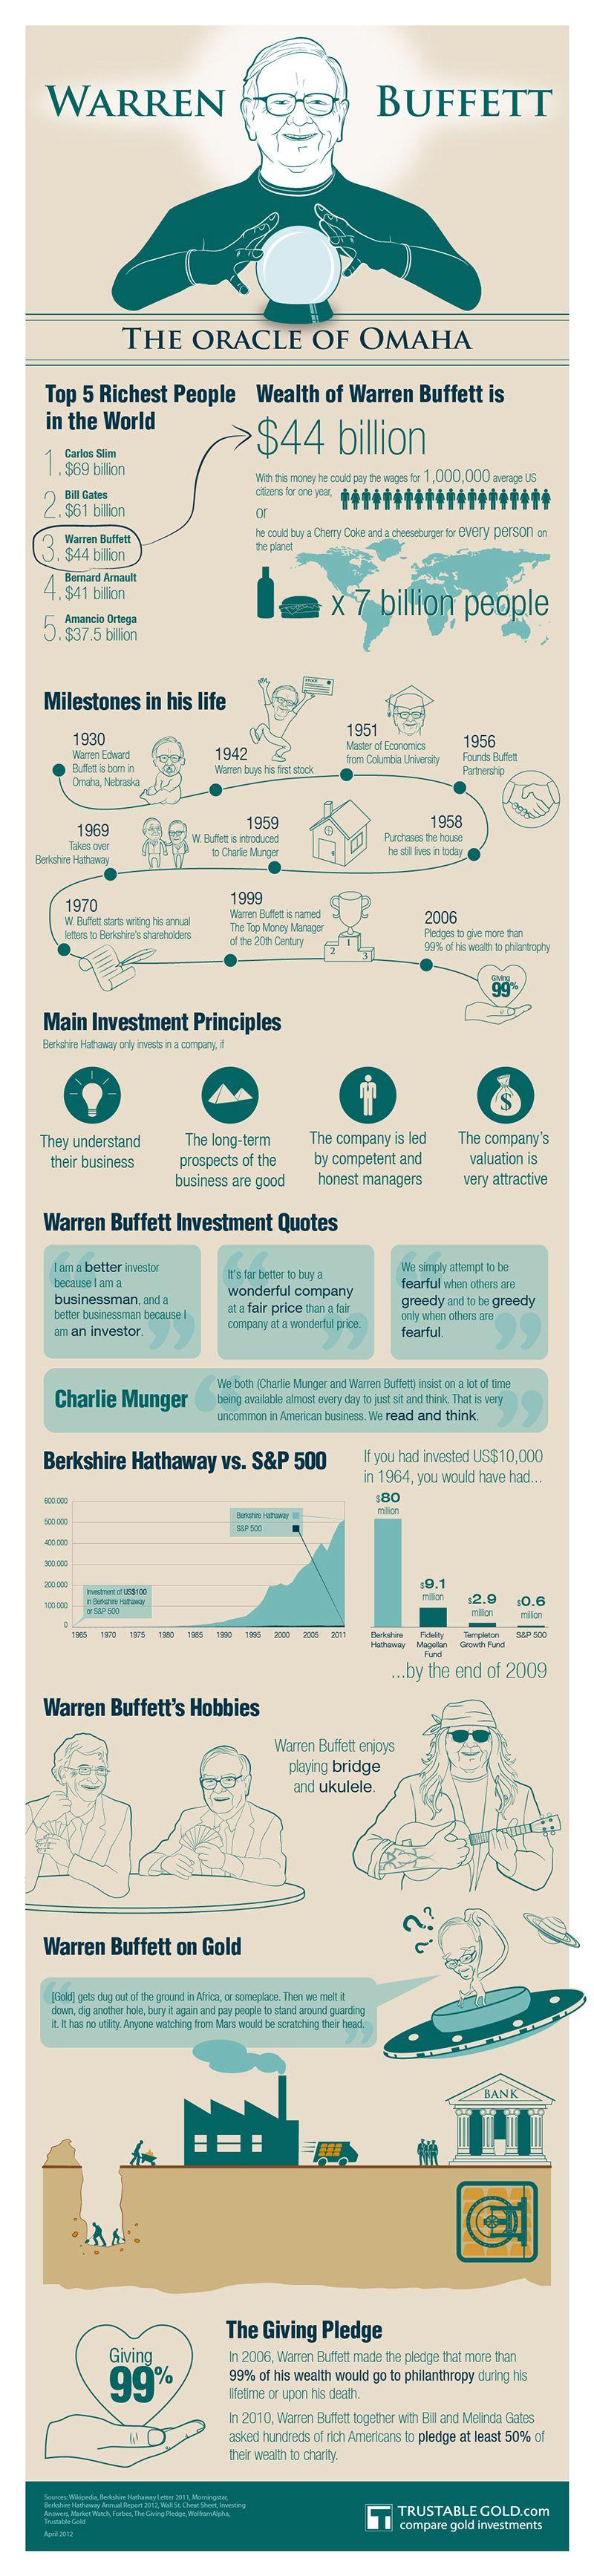 imeline de Warren Buffett #infografia #infographic #economia